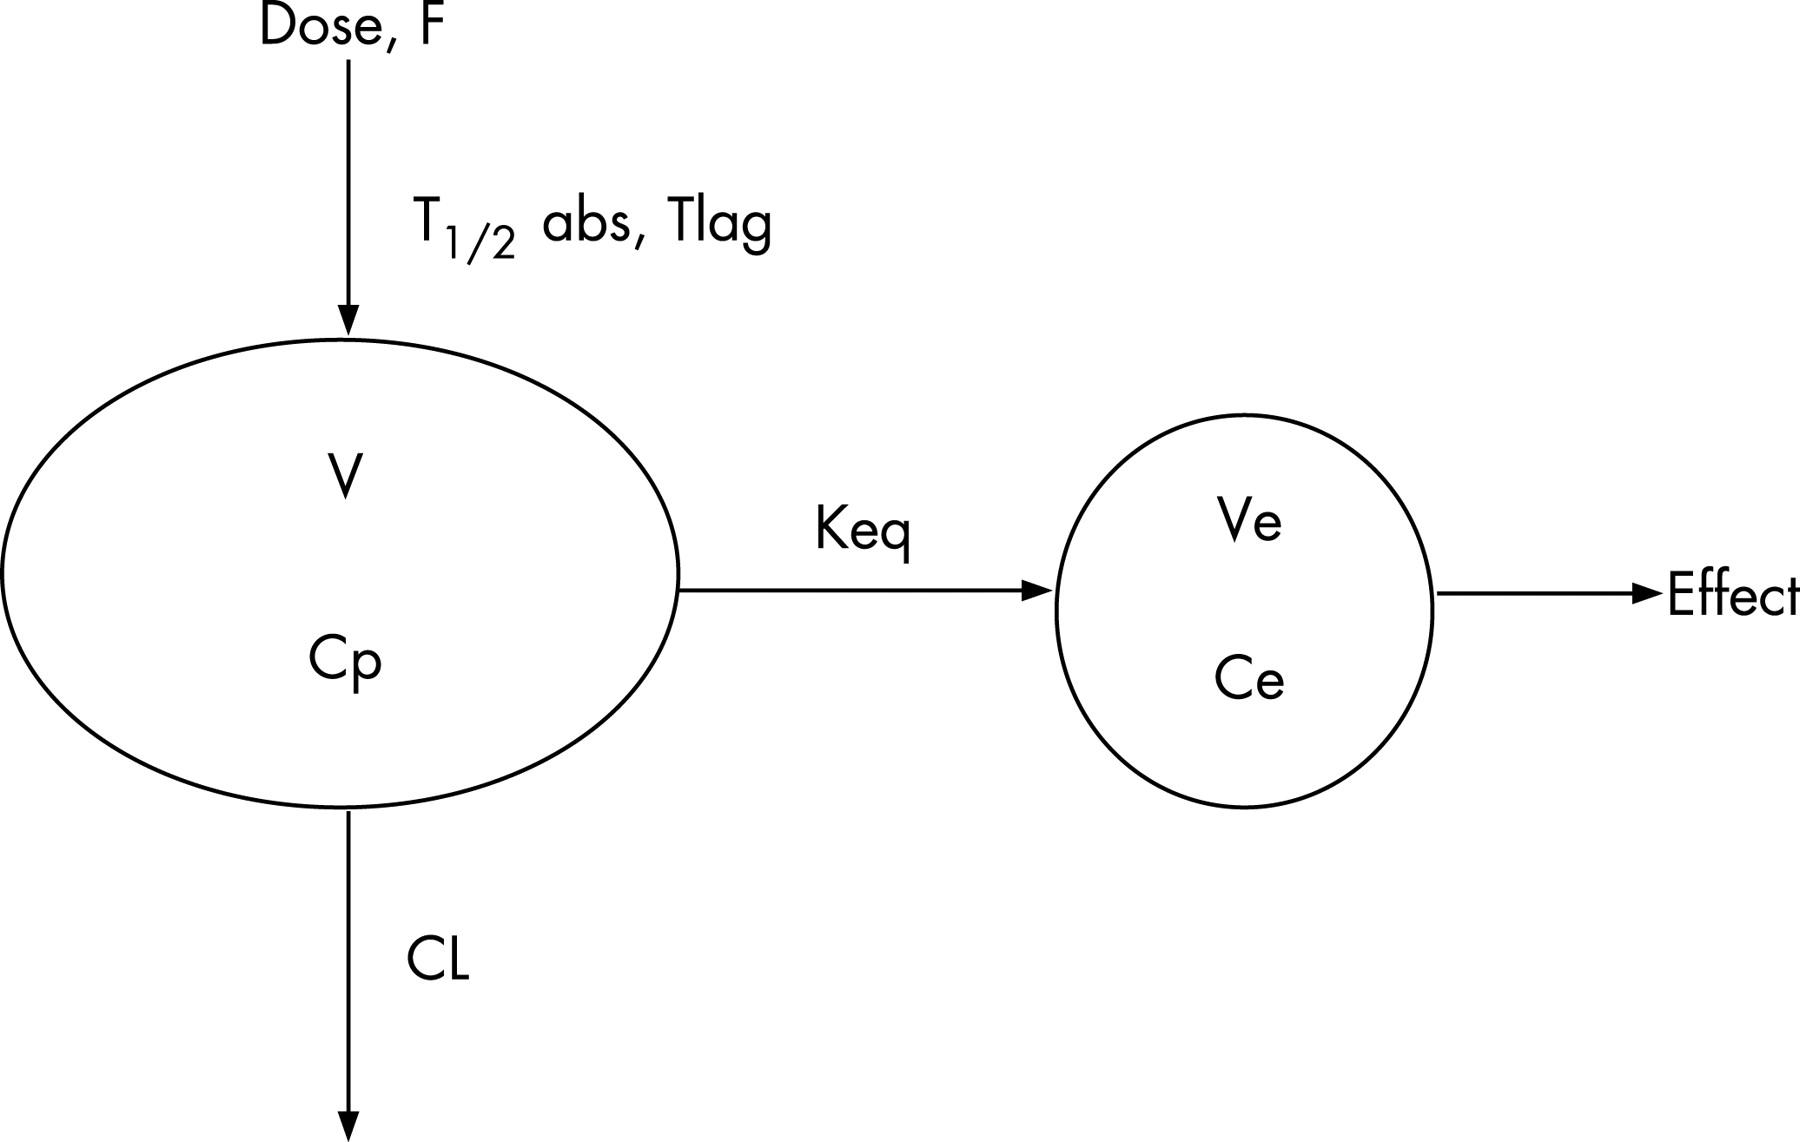 Paracetamol (acetaminophen) pharmacodynamics: interpreting